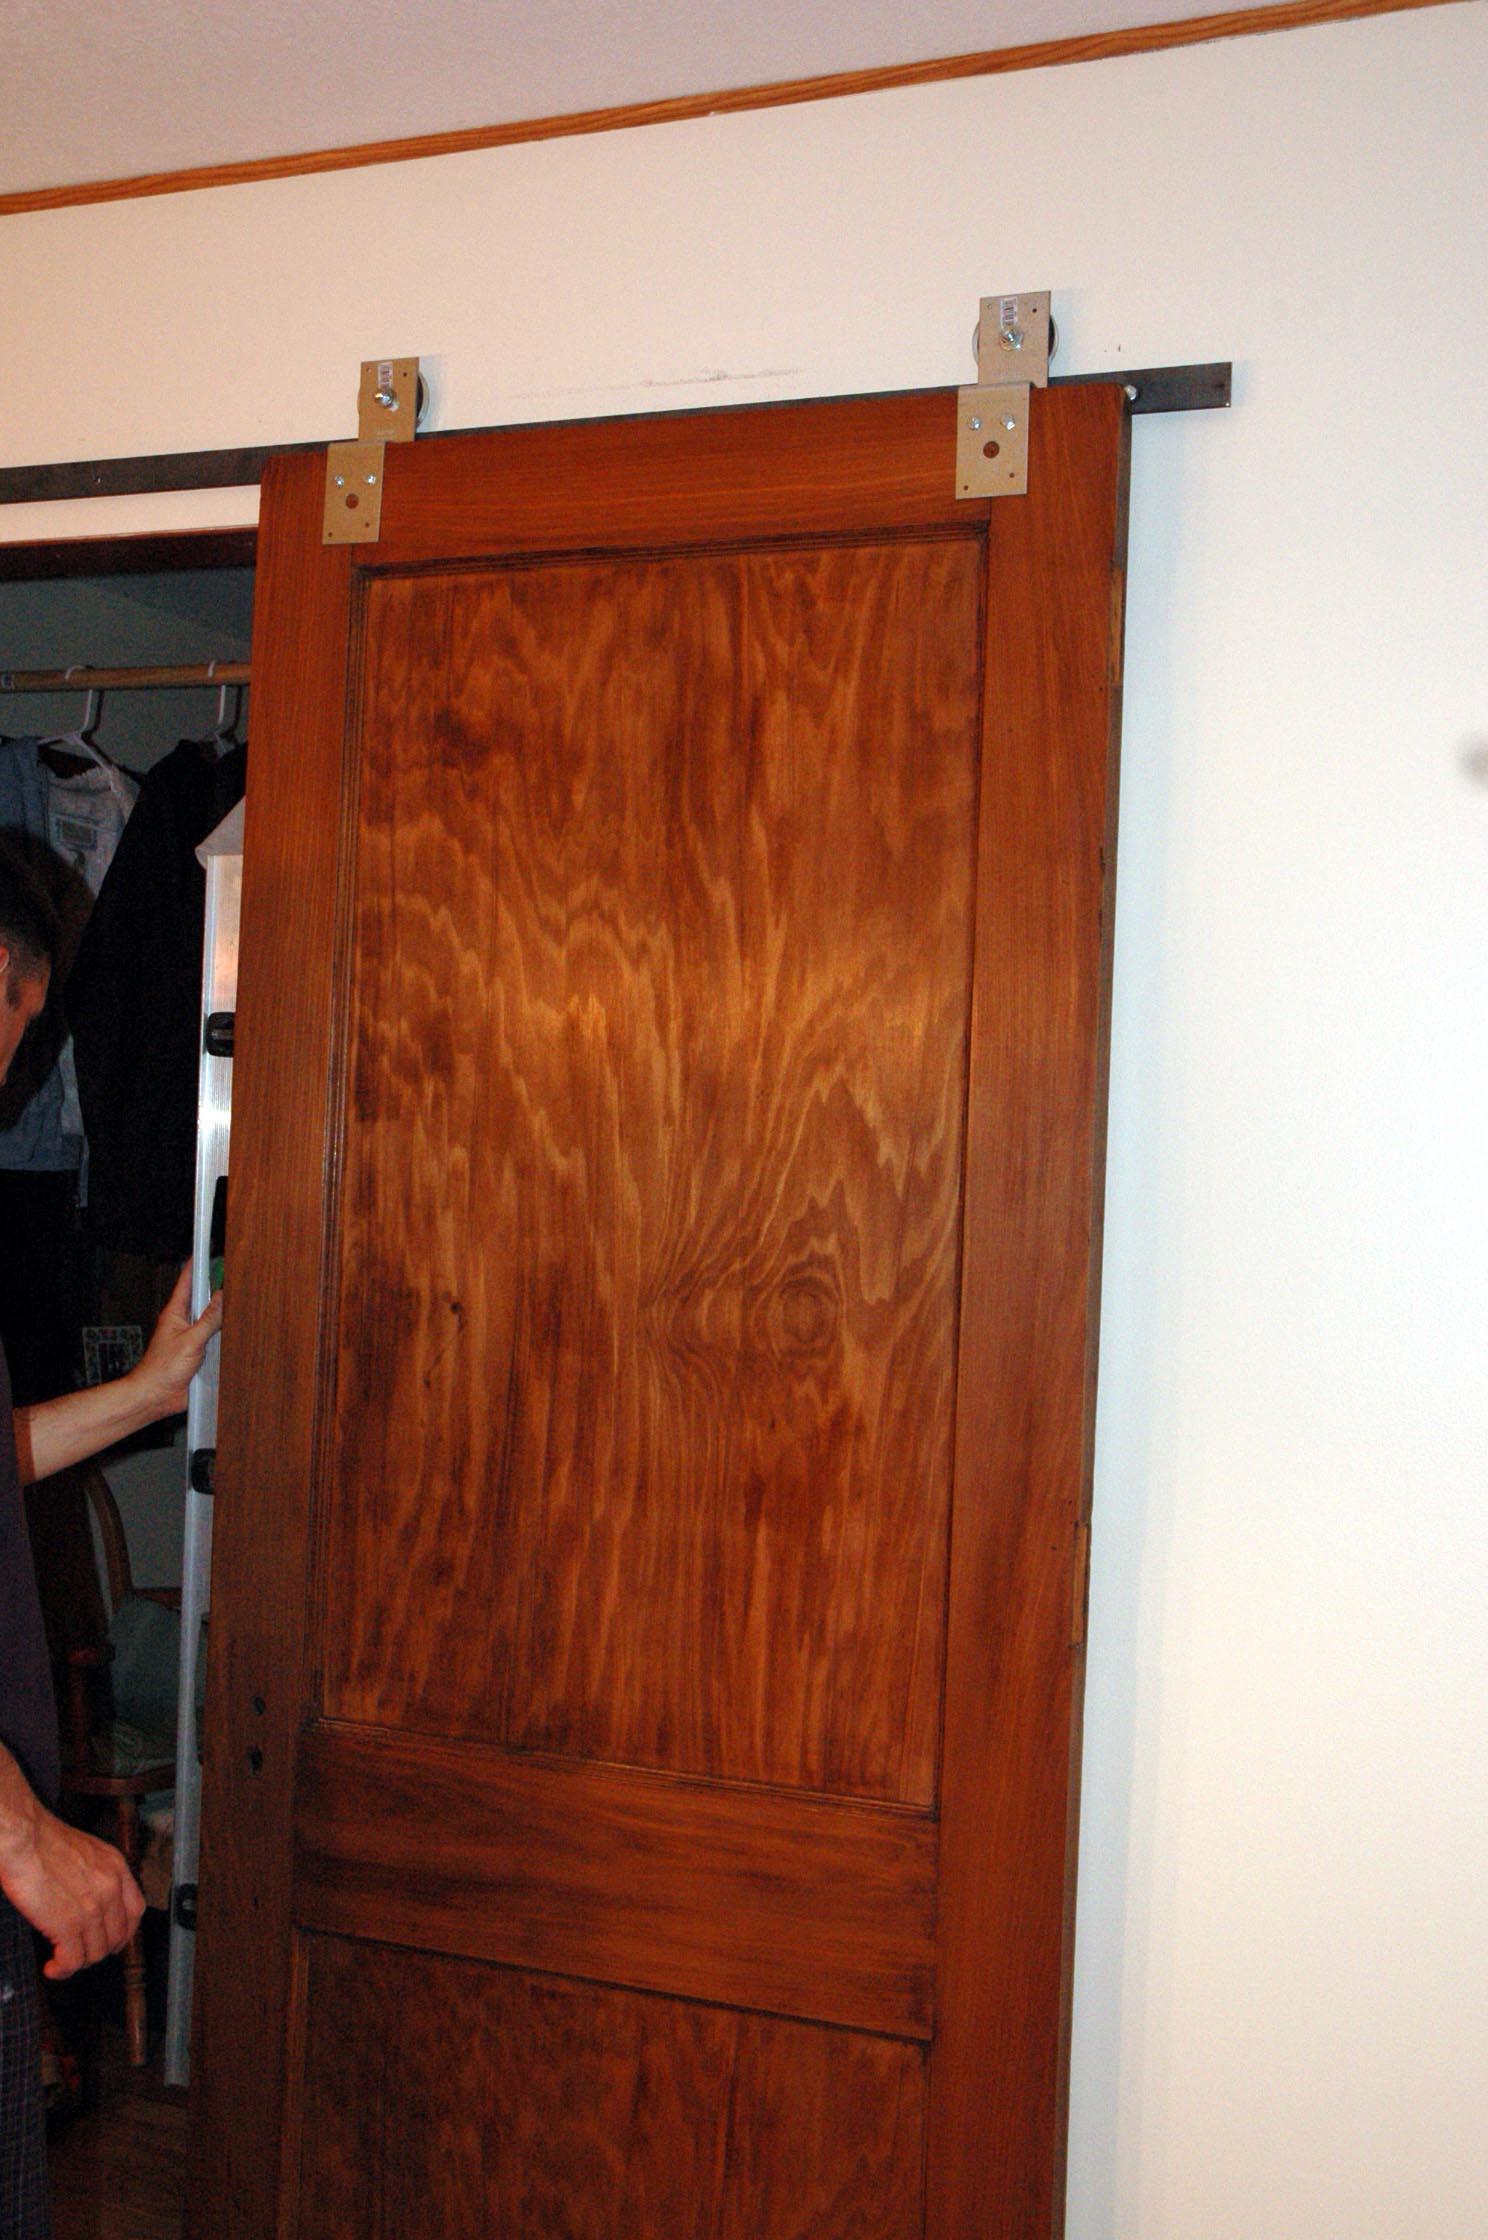 Best ideas about DIY Barn Door Tracks . Save or Pin DIY Barn Door Hardware Now.